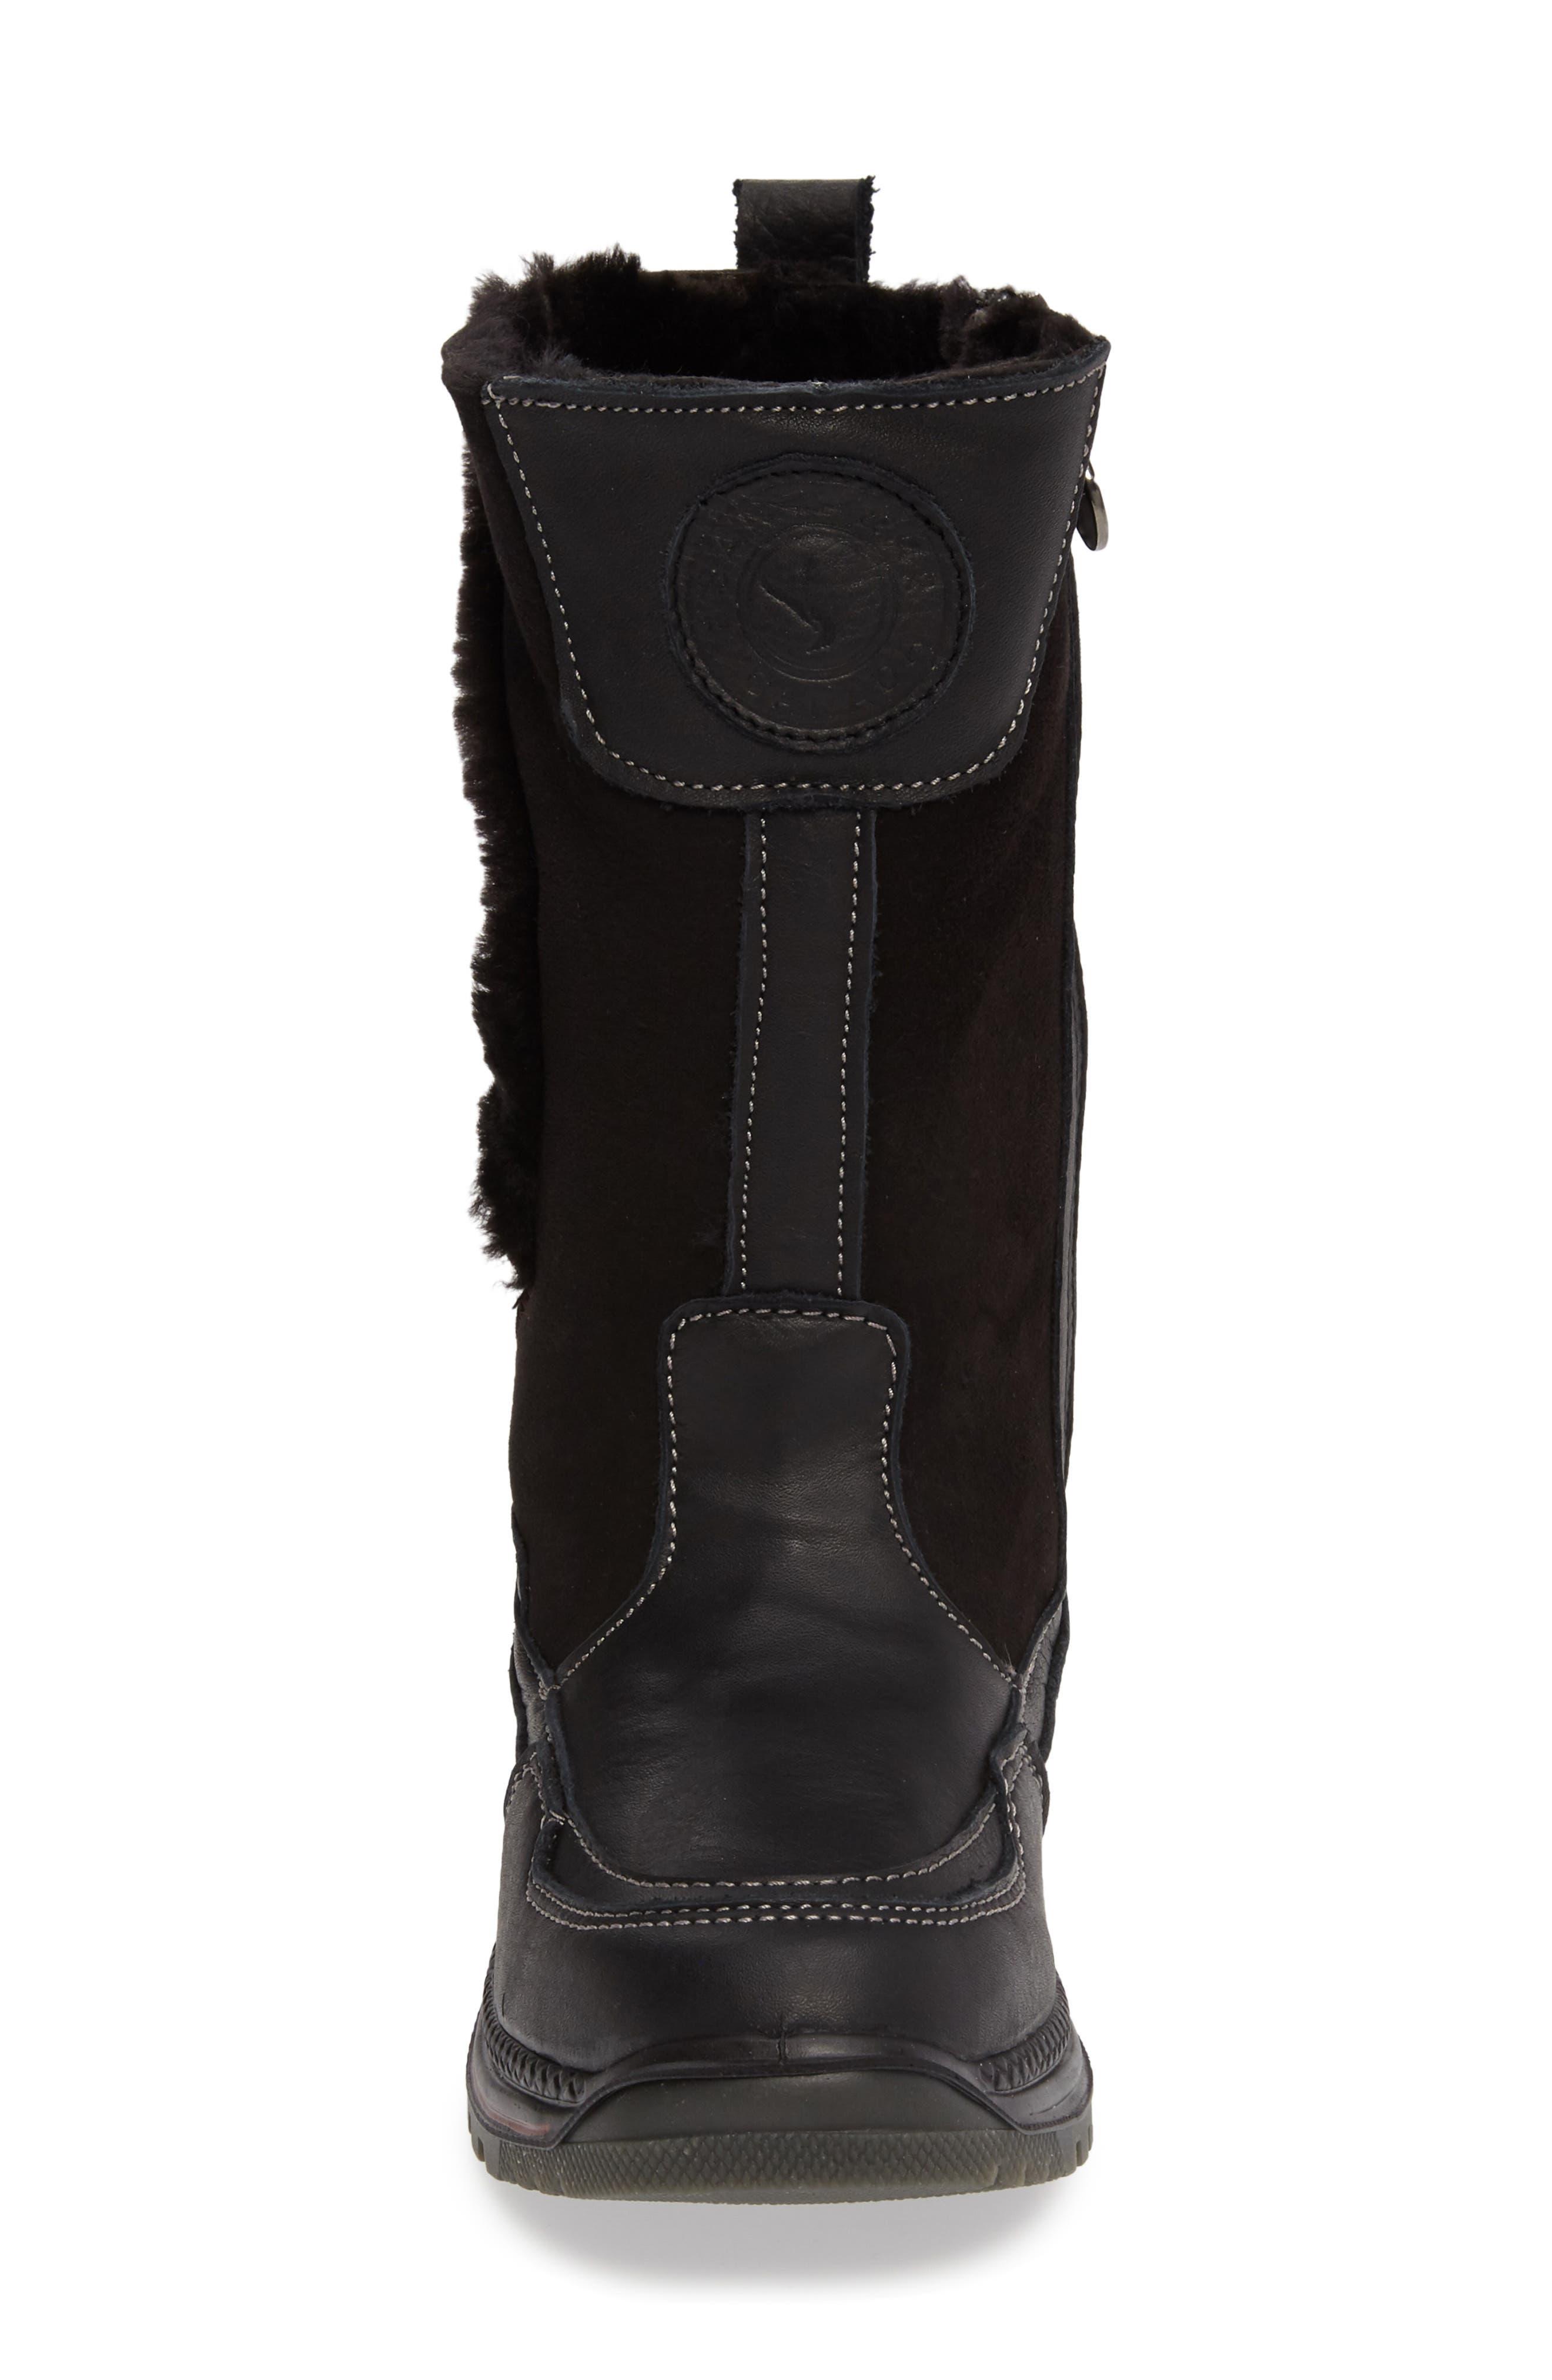 Seraphine Genuine Shearling Waterproof Winter Boot,                             Alternate thumbnail 4, color,                             001